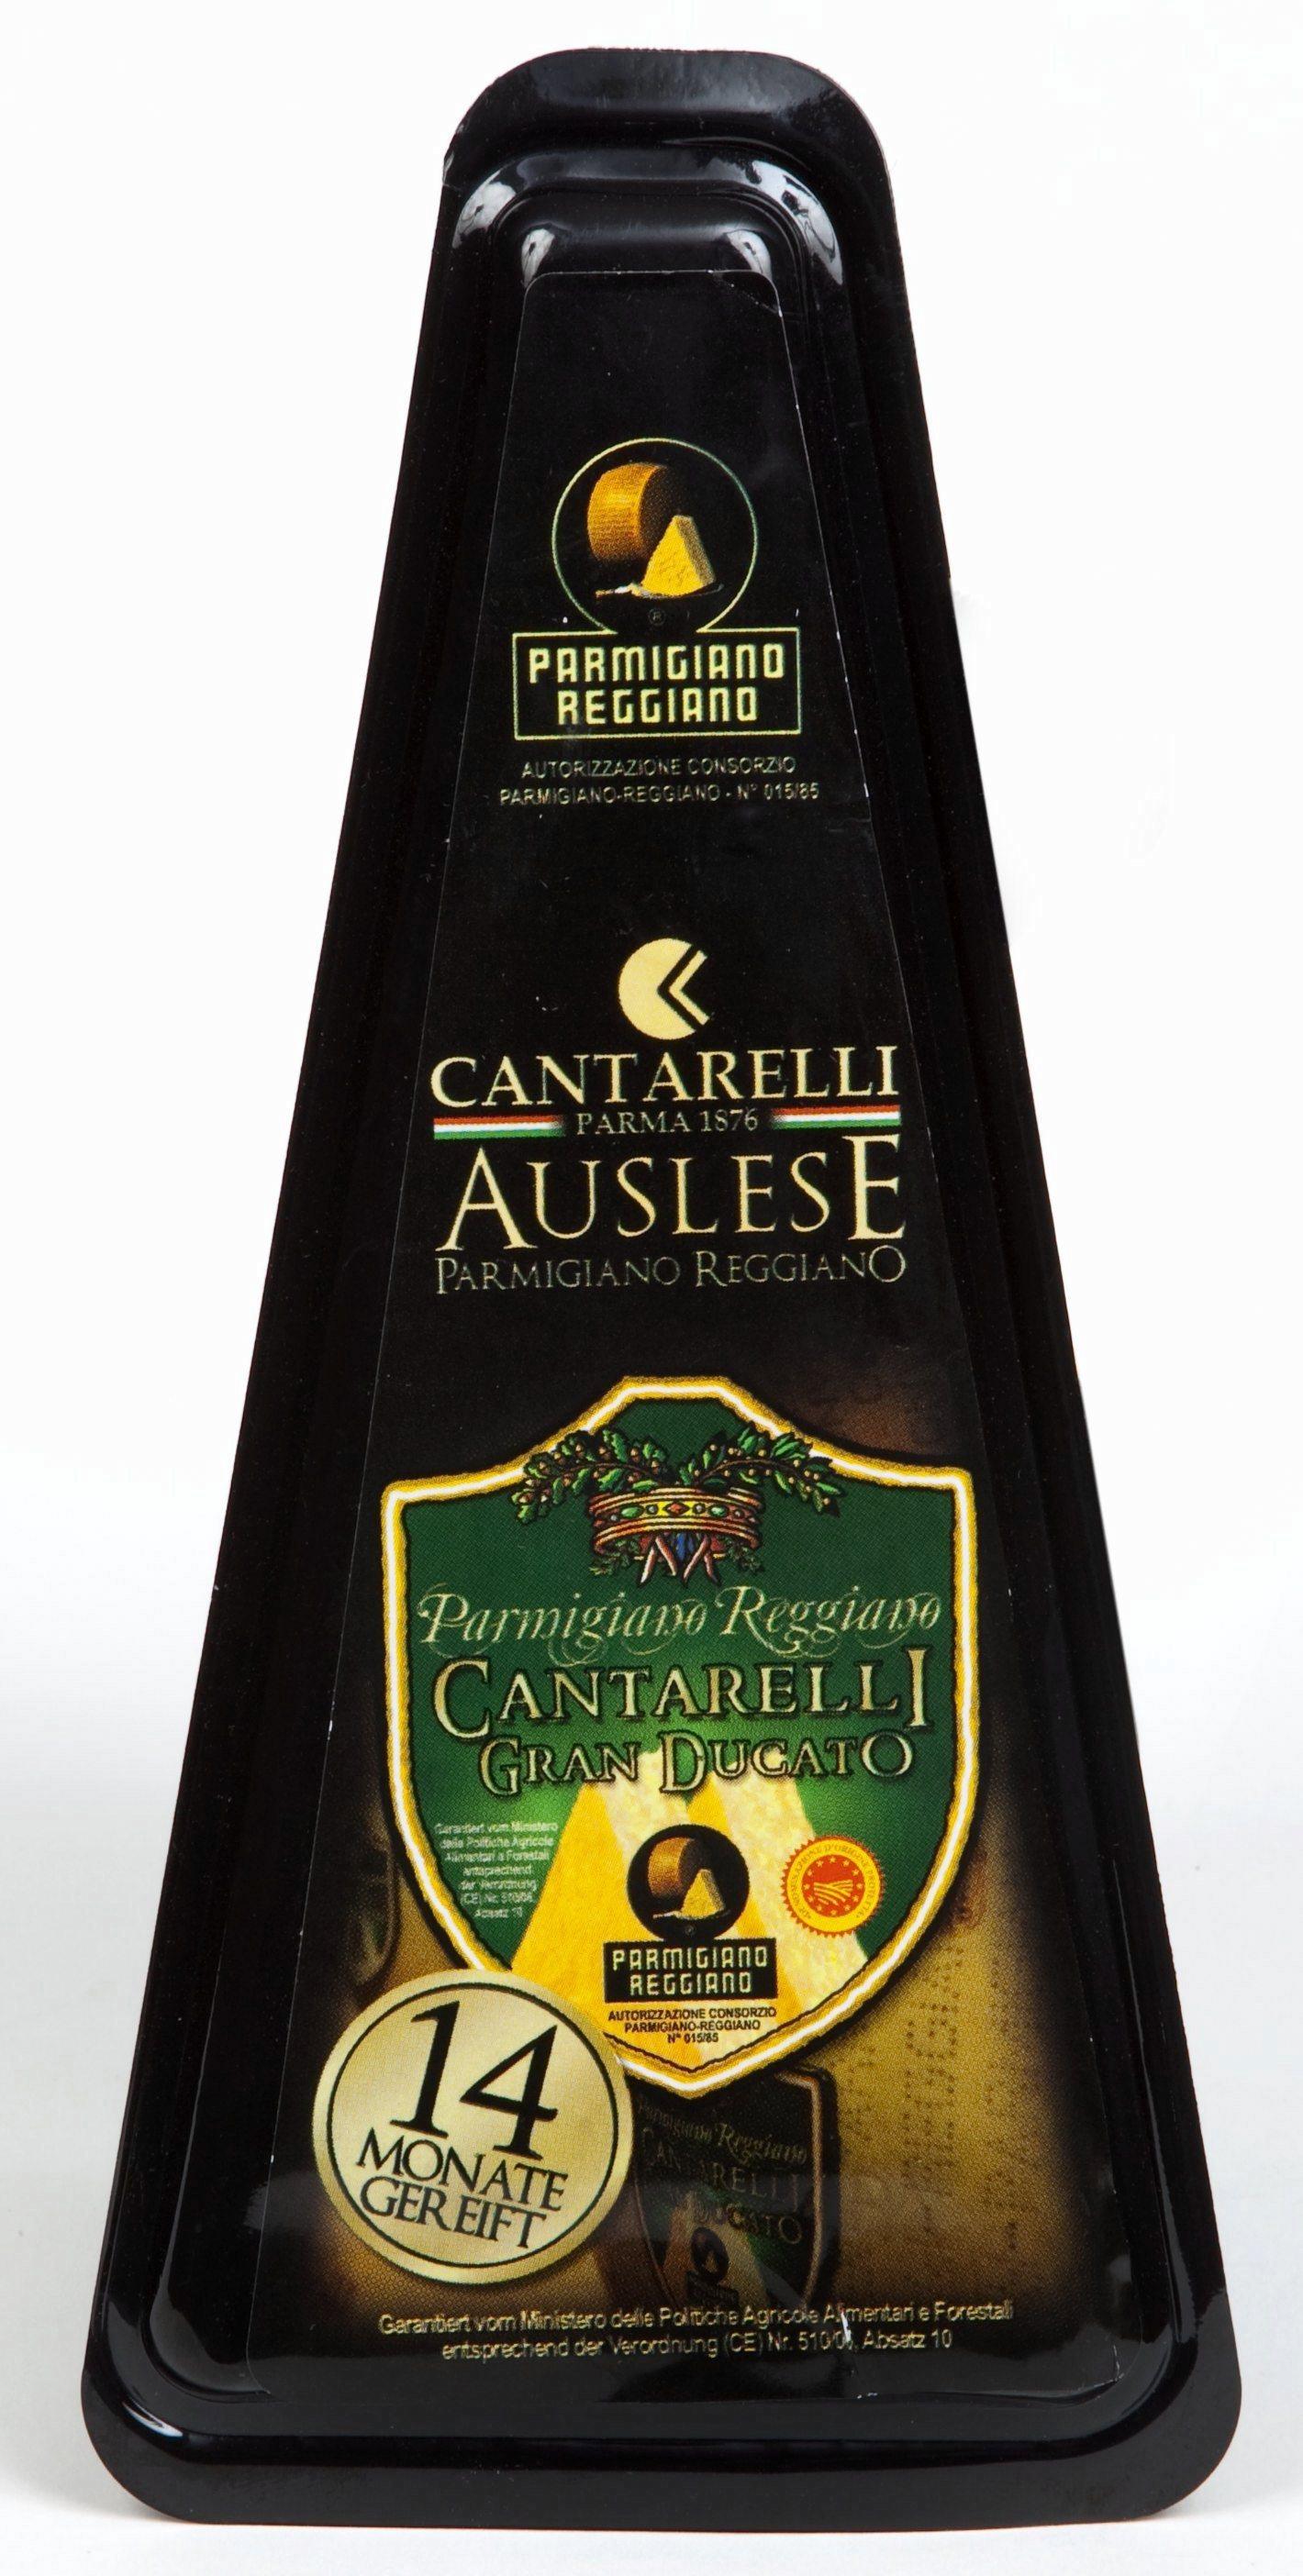 Parmigiano Reggiano Granducato 14 mesi 200 g Cantarelli Parmesankäse 14 Monate gereift  ( Kühlartikel)